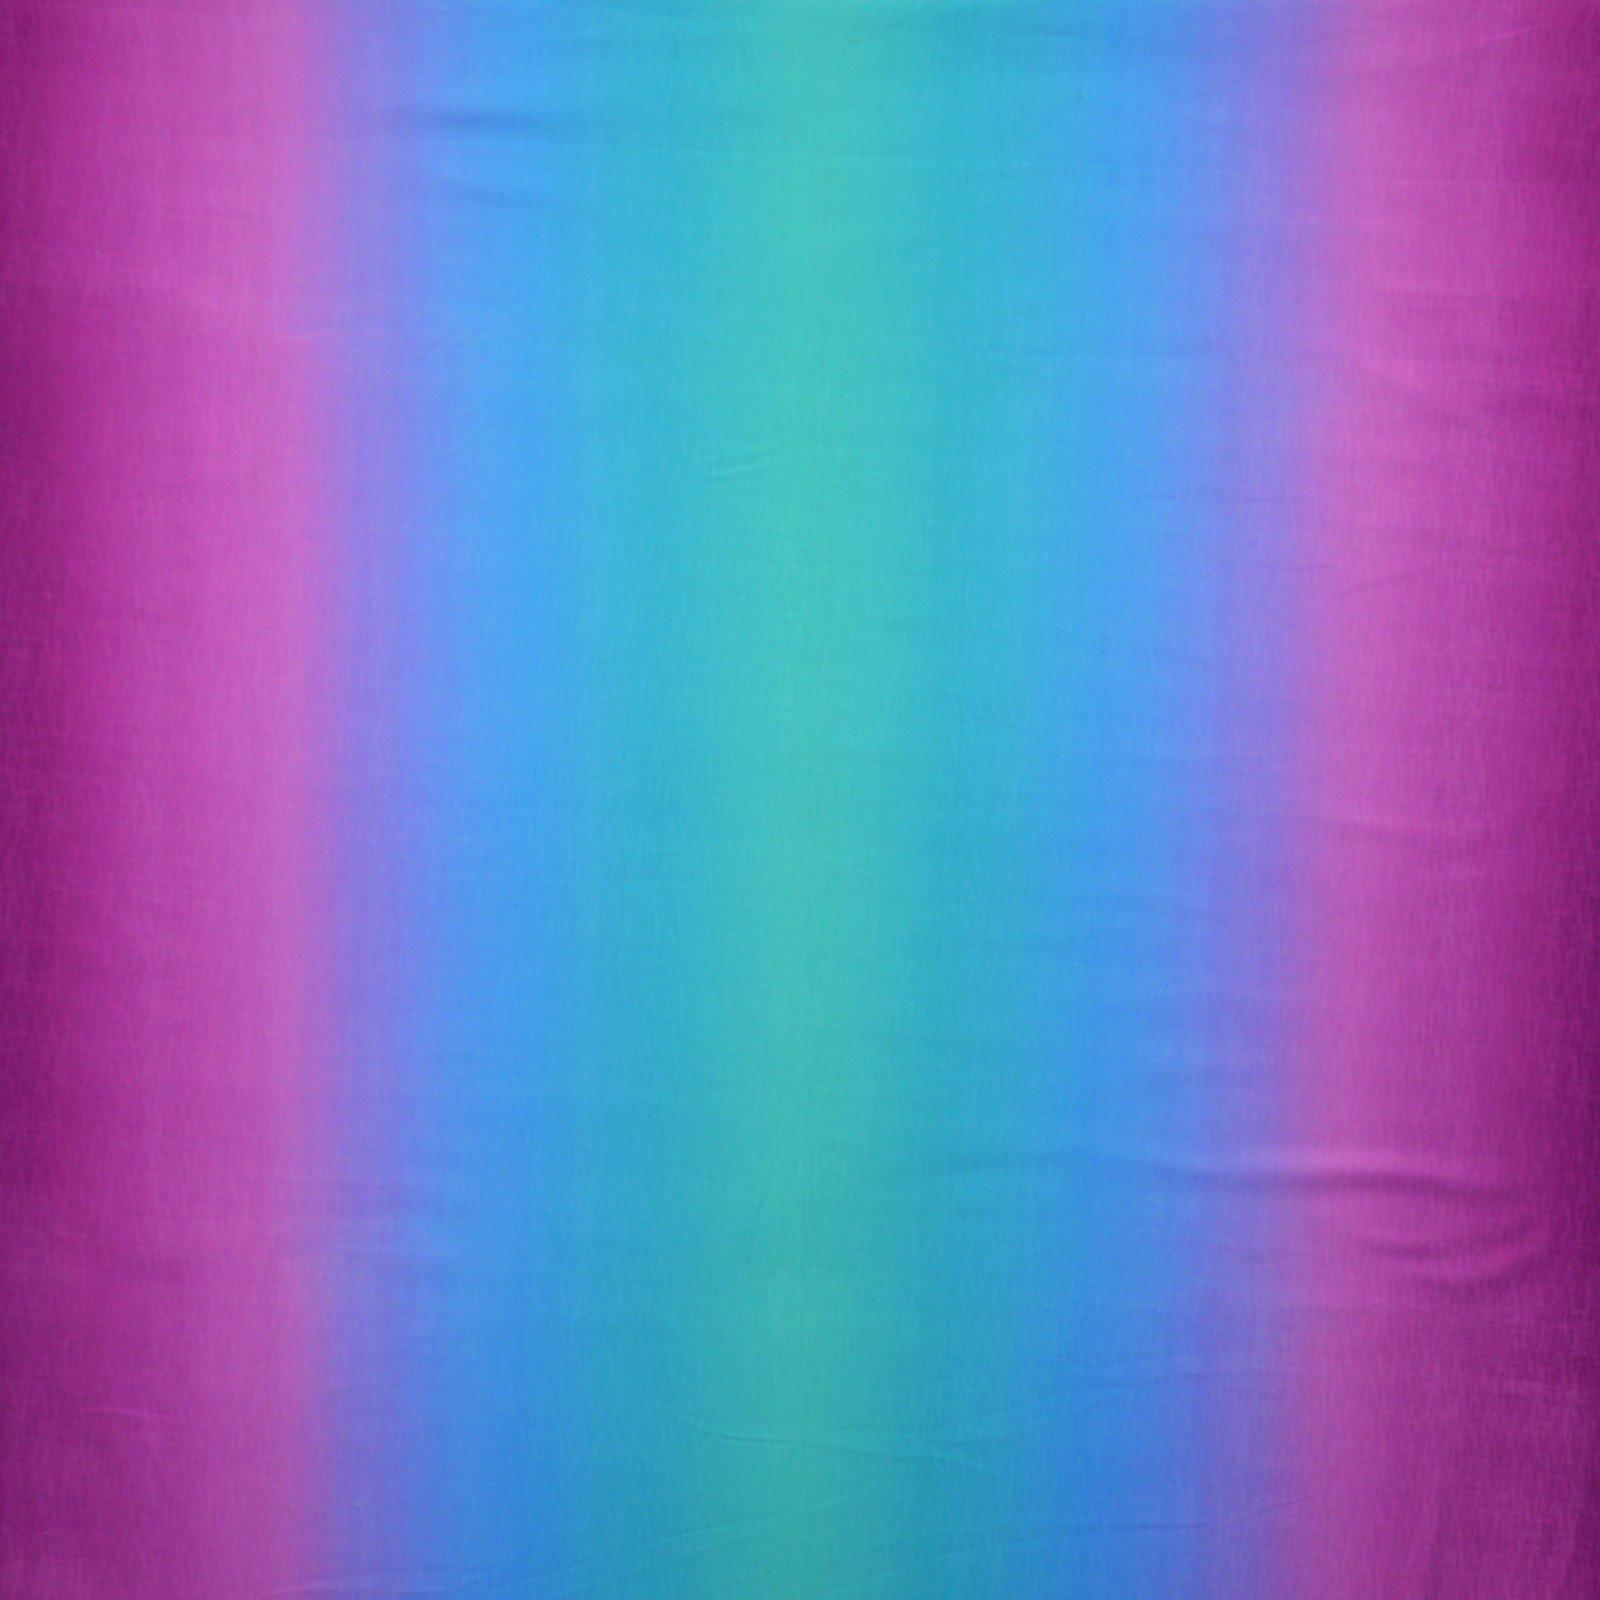 203 Gelato - Purple / Blue Ombre<br/>Elite/Cara